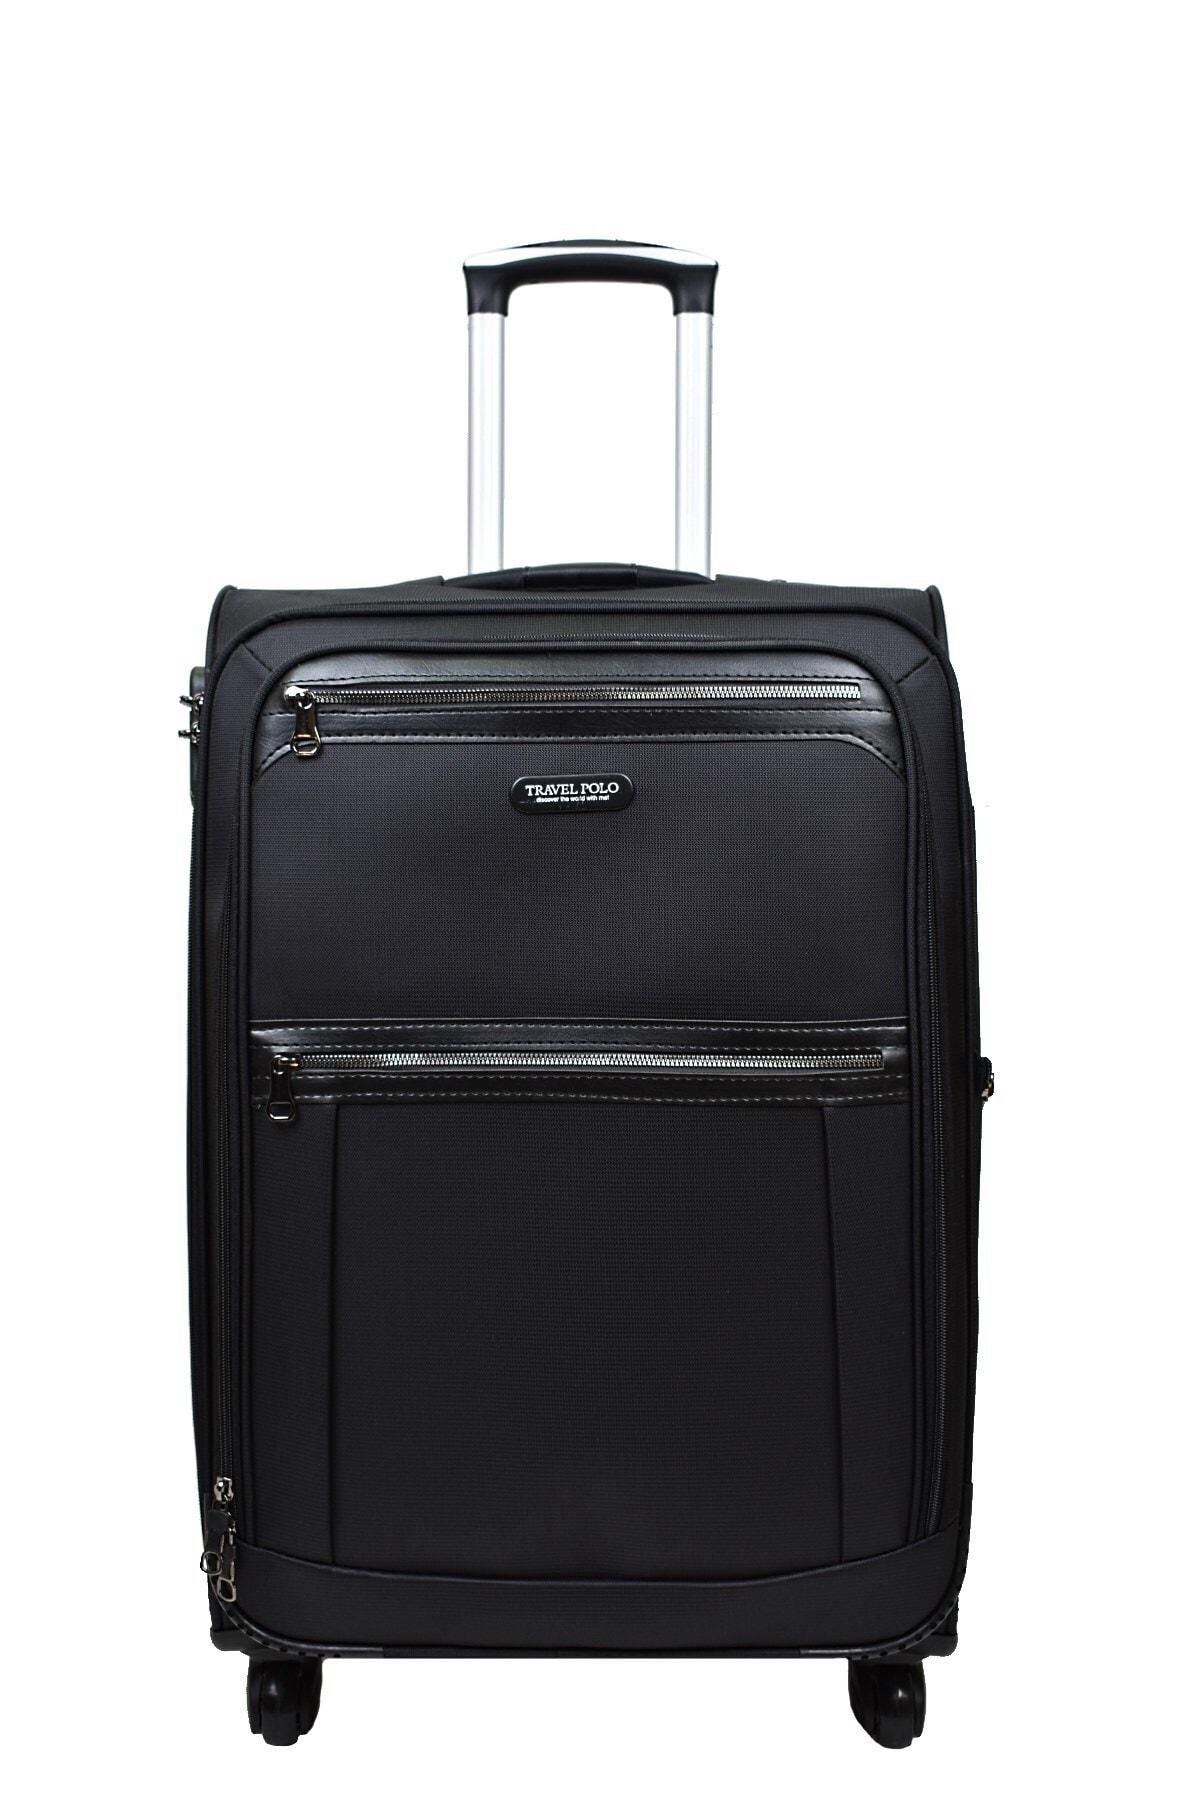 Anka 2'li Valiz Seti Travel Polo Lüx Kumaş Orta Boy Ve Kabin Boy Siyah 2'li Set 2